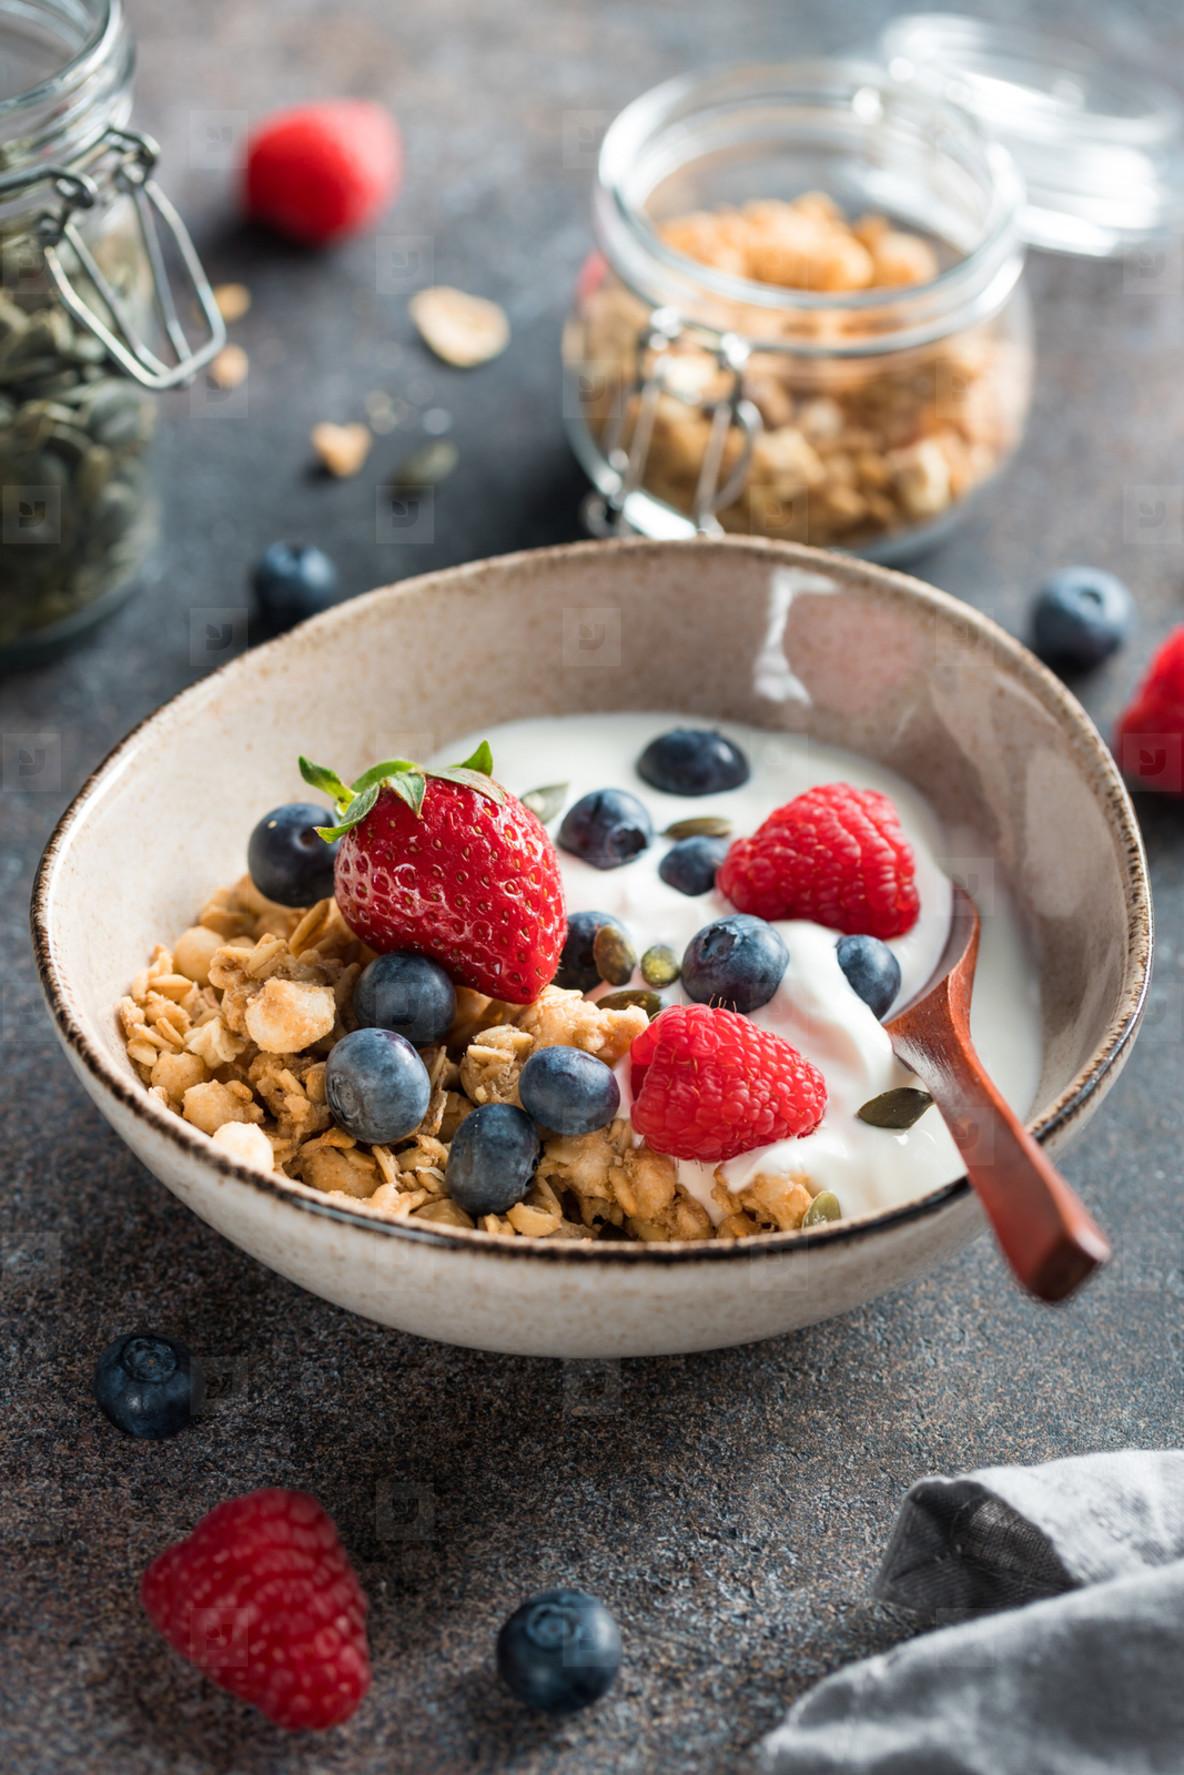 Healthy breakfast  cereal with berries and yogurt